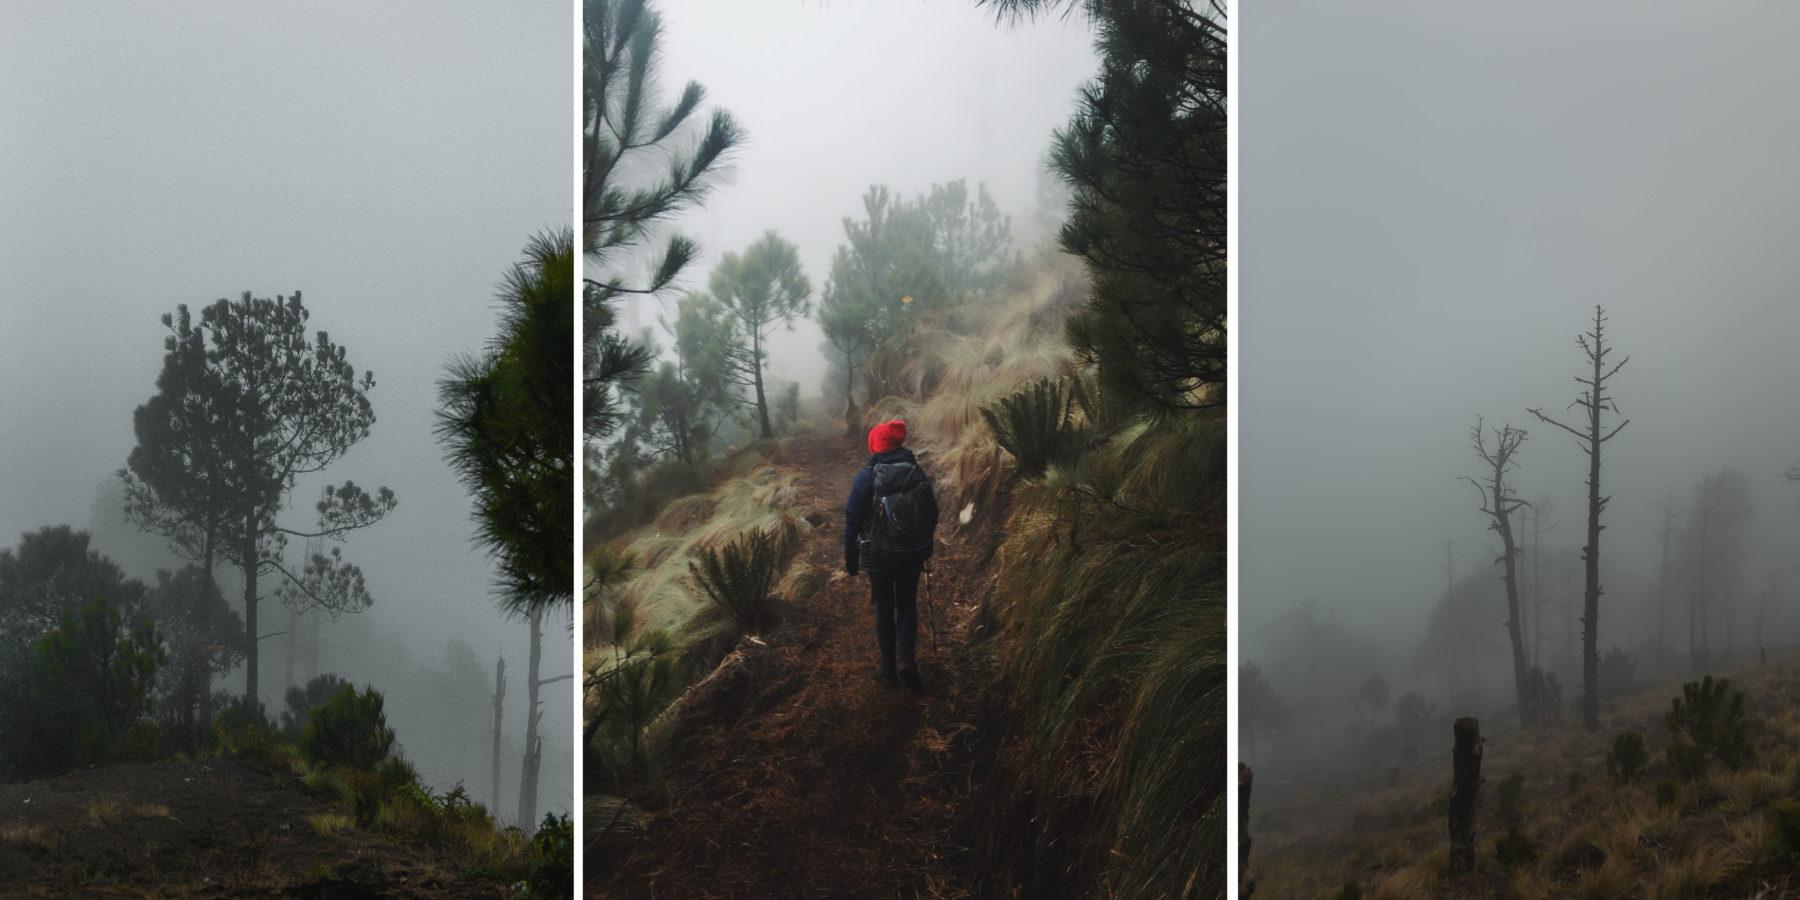 volcano acatenango sunrise tour guatemala central america adventure orange sky cloud forest misty green above the clouds